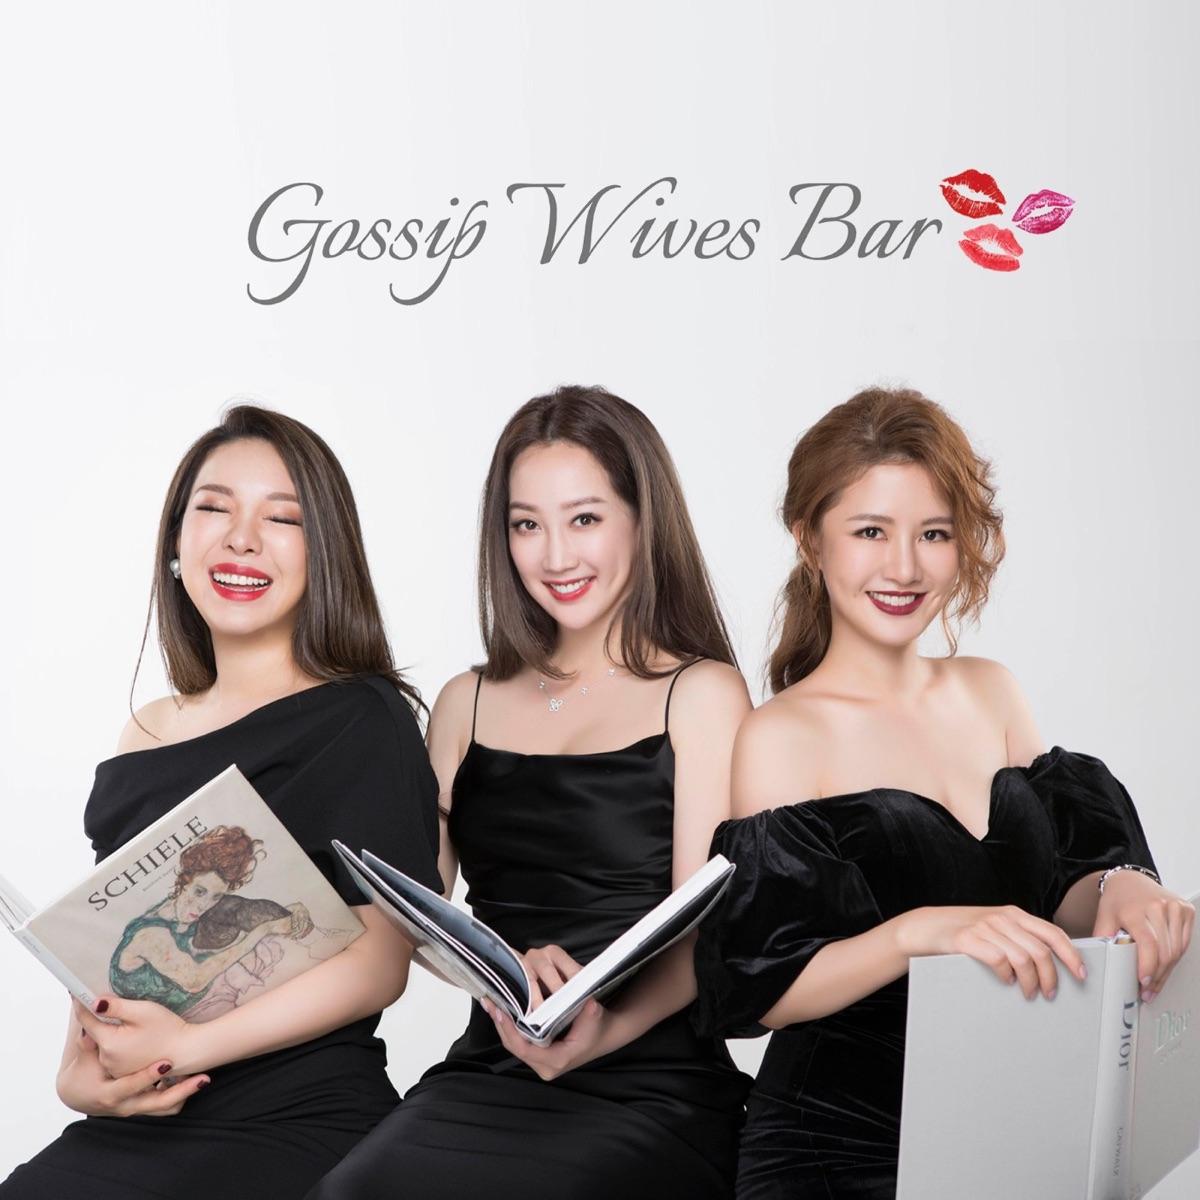 人妻療心吧 Gossip Wives Bar